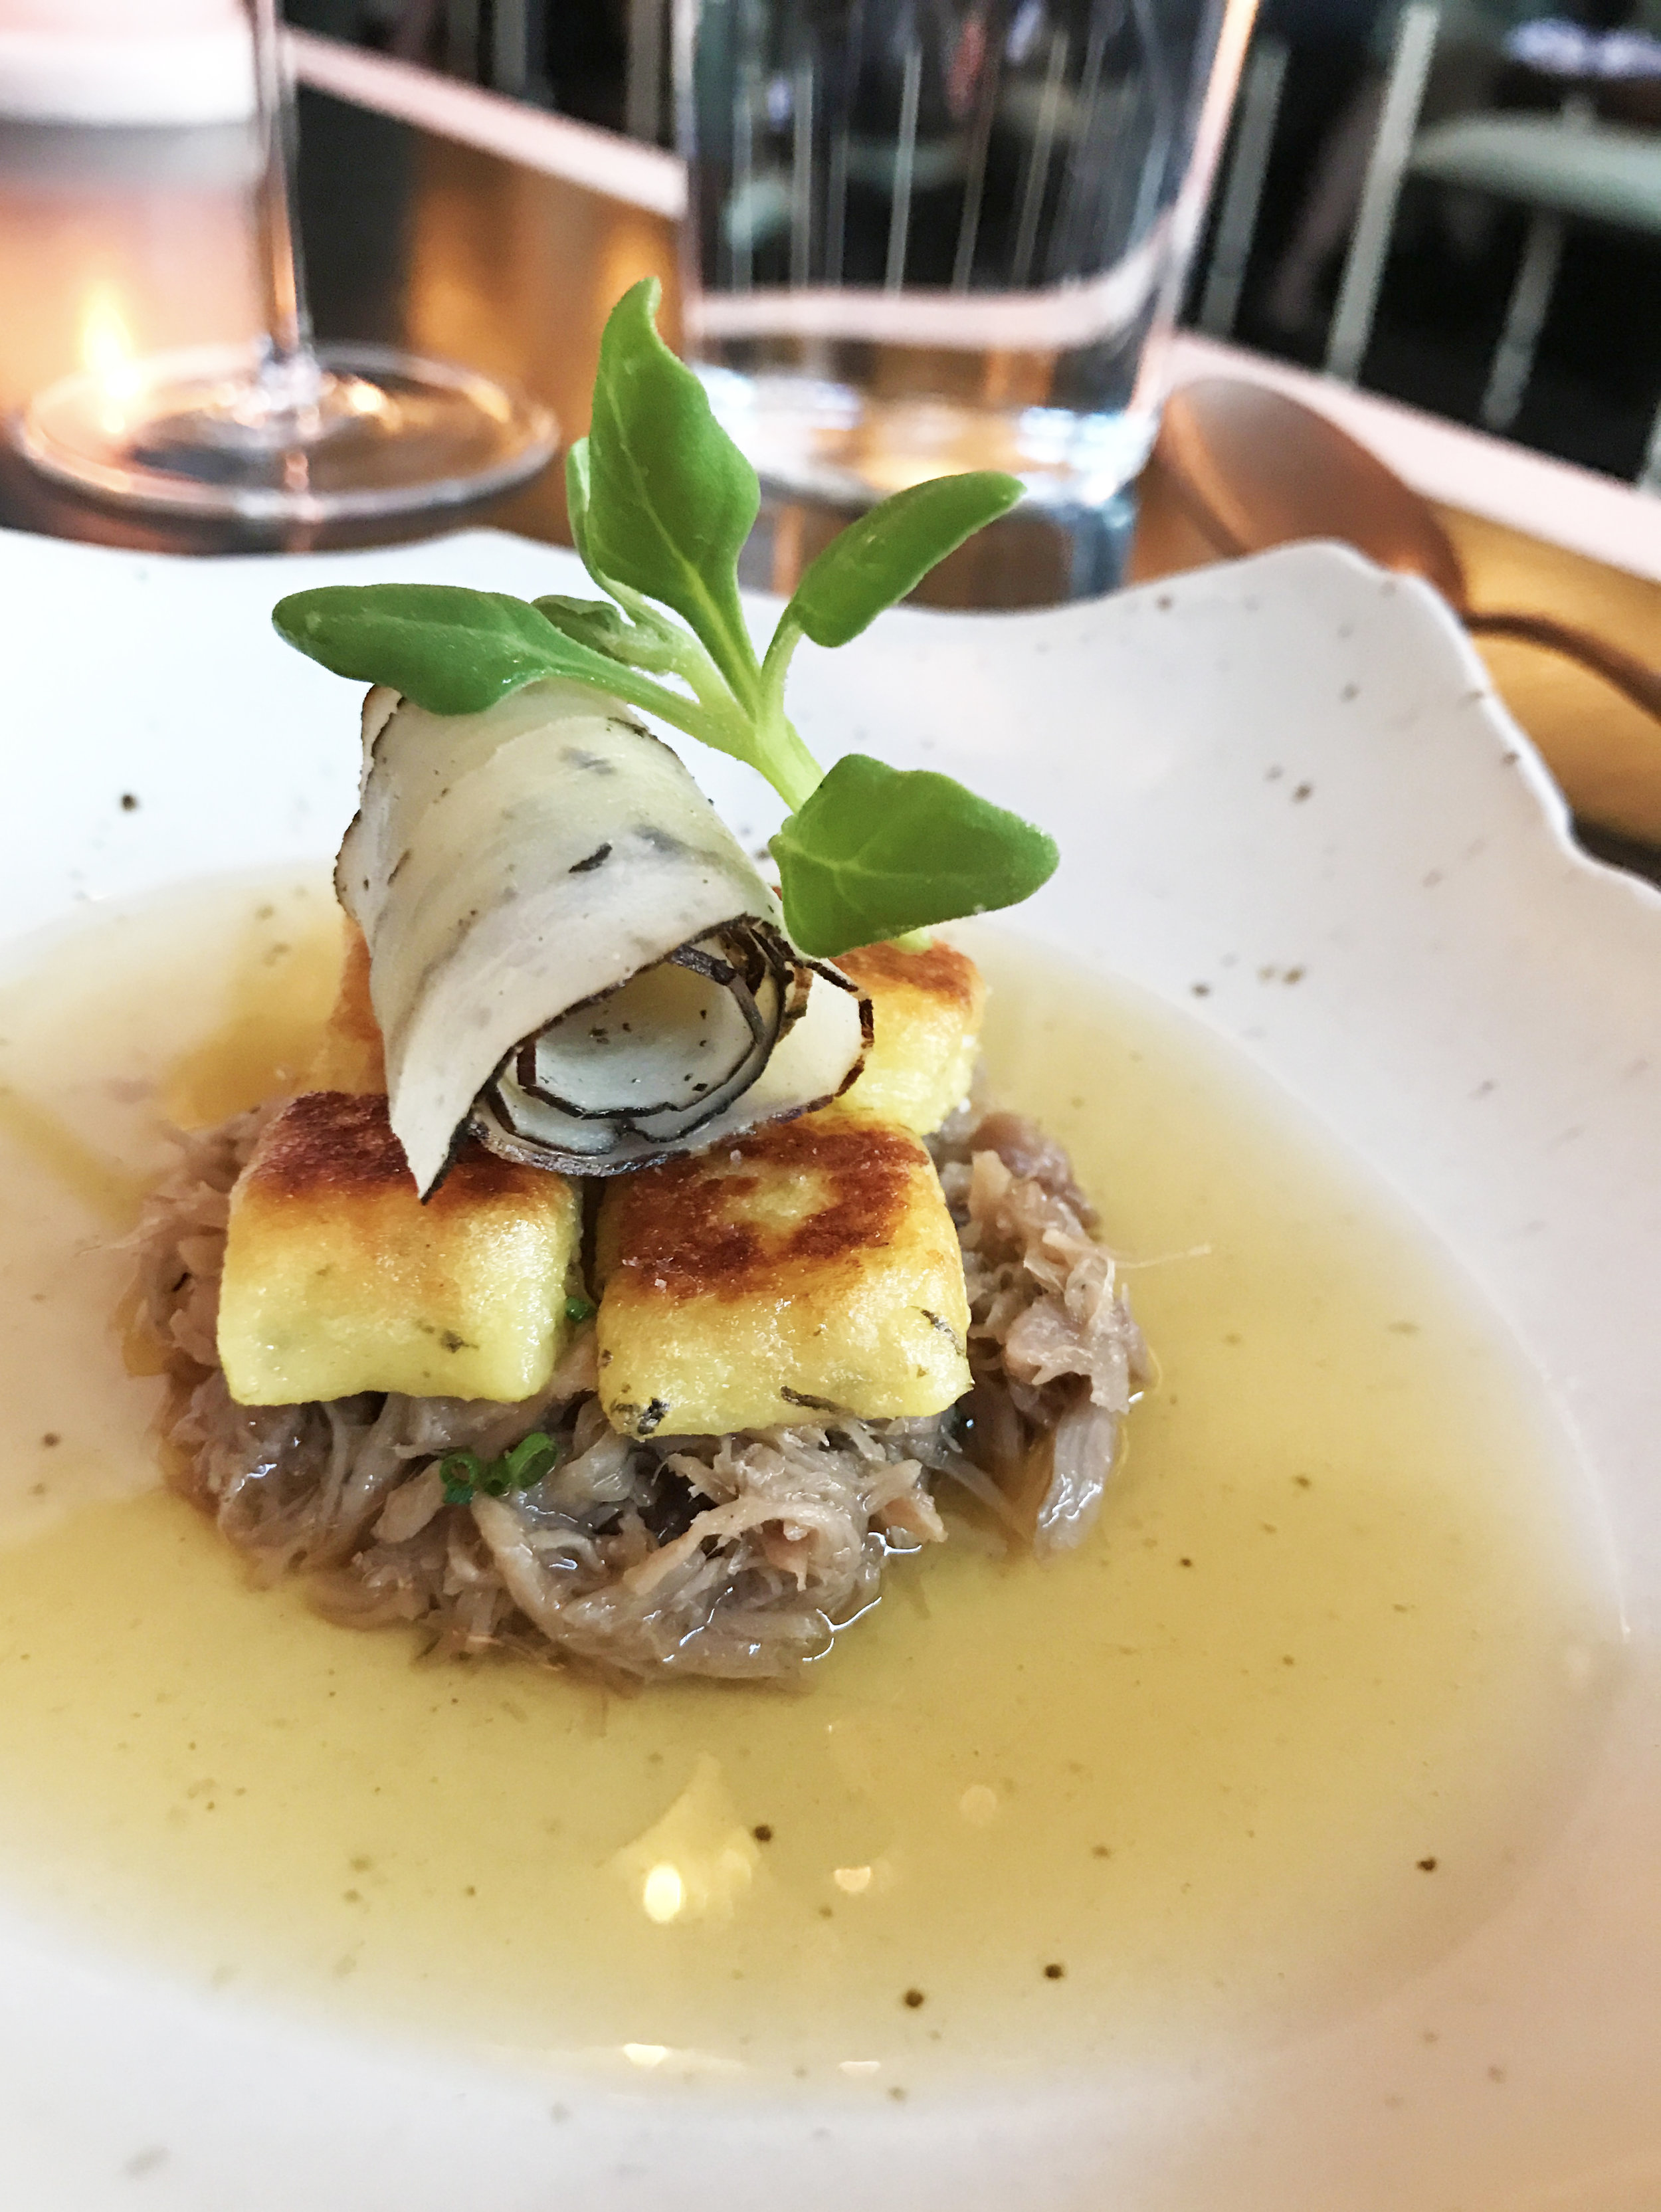 Gnocchi with smoked ham hock, salsify, and black truffle